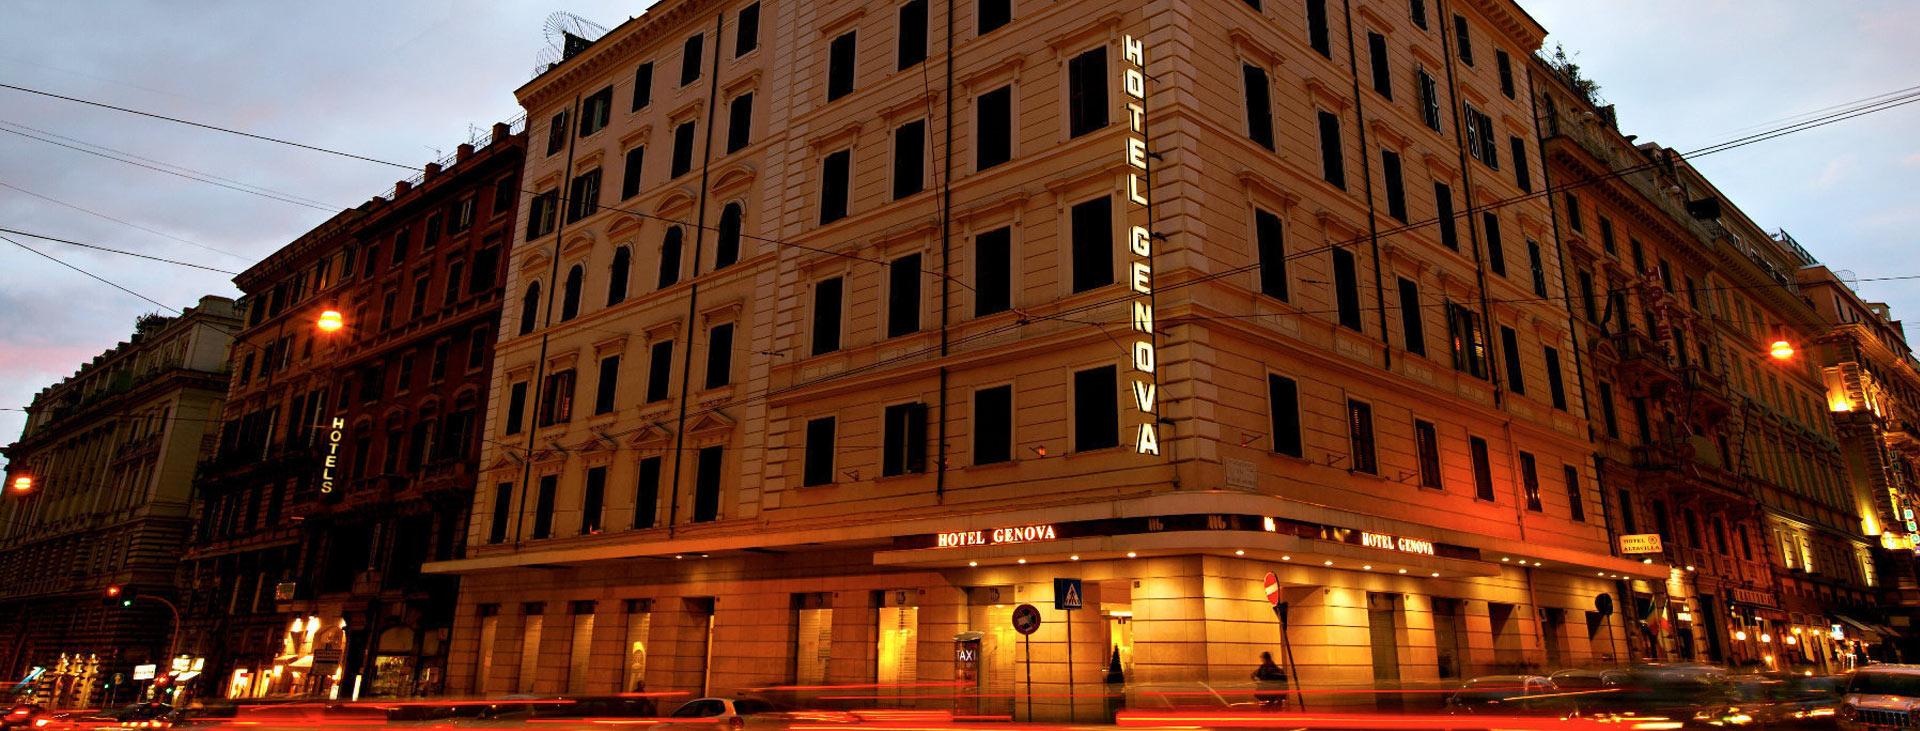 Genova, Rooma, Italia